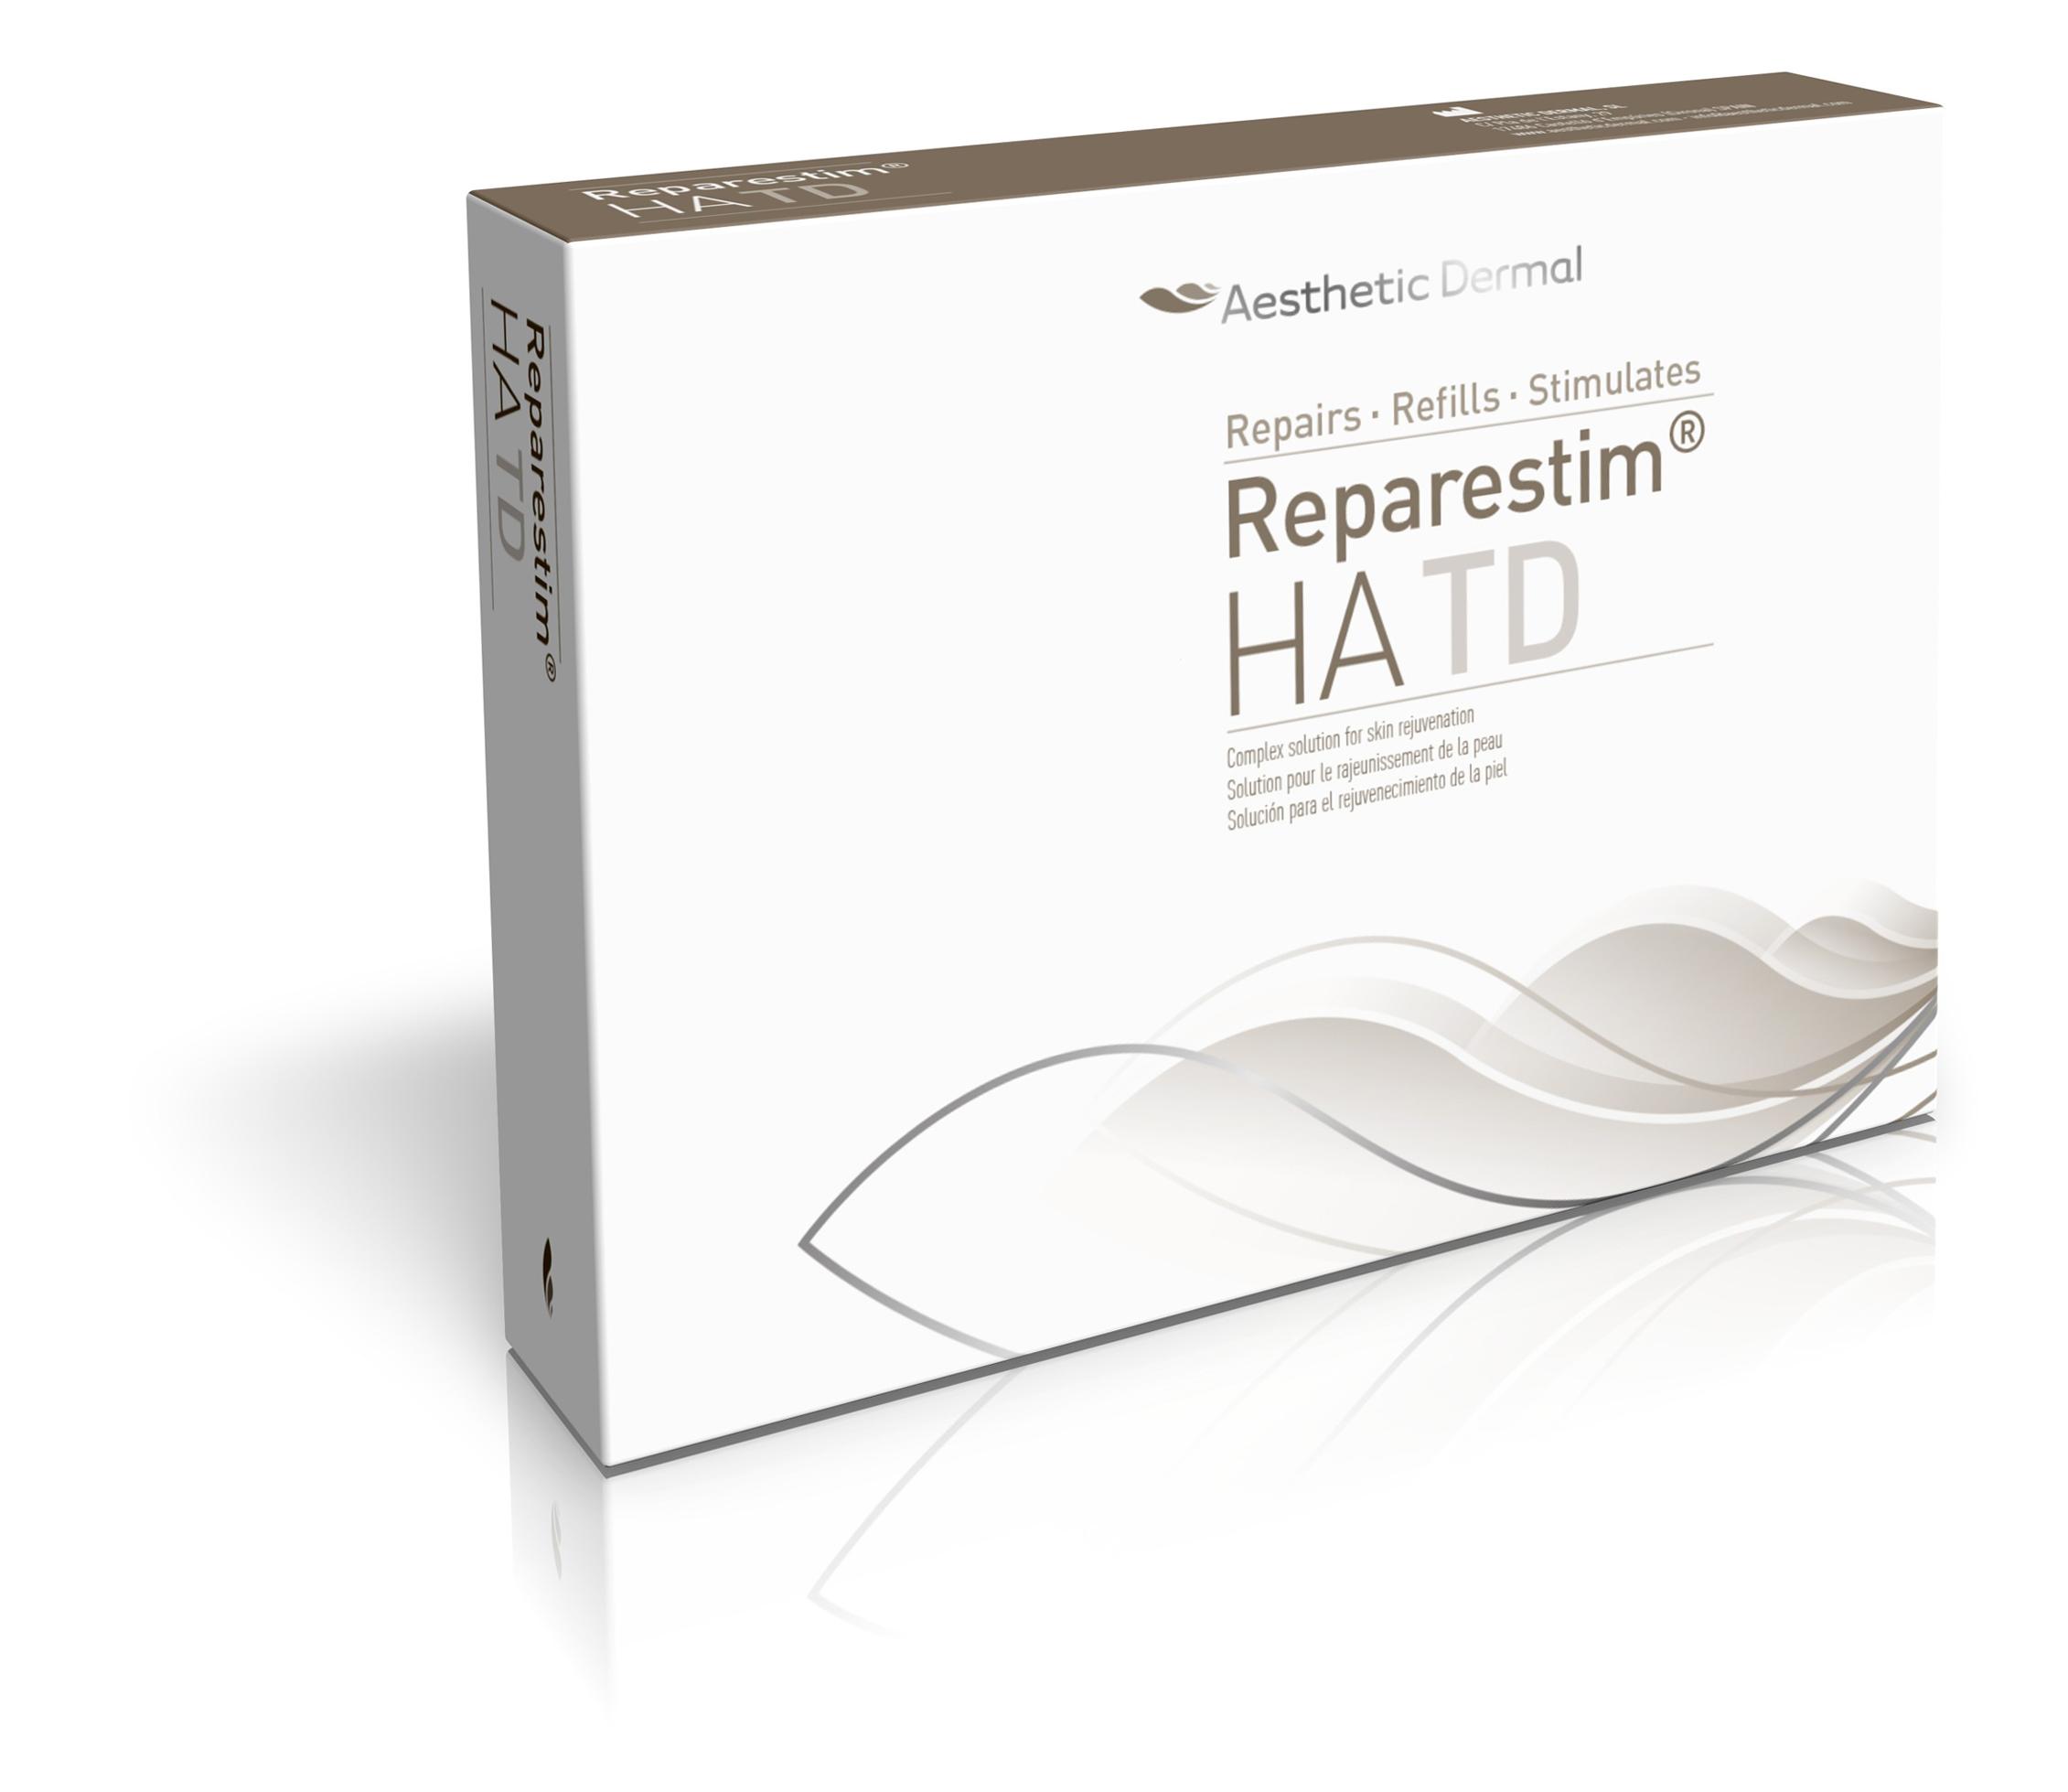 Aesthetic Dermal - Reparestim HA TD